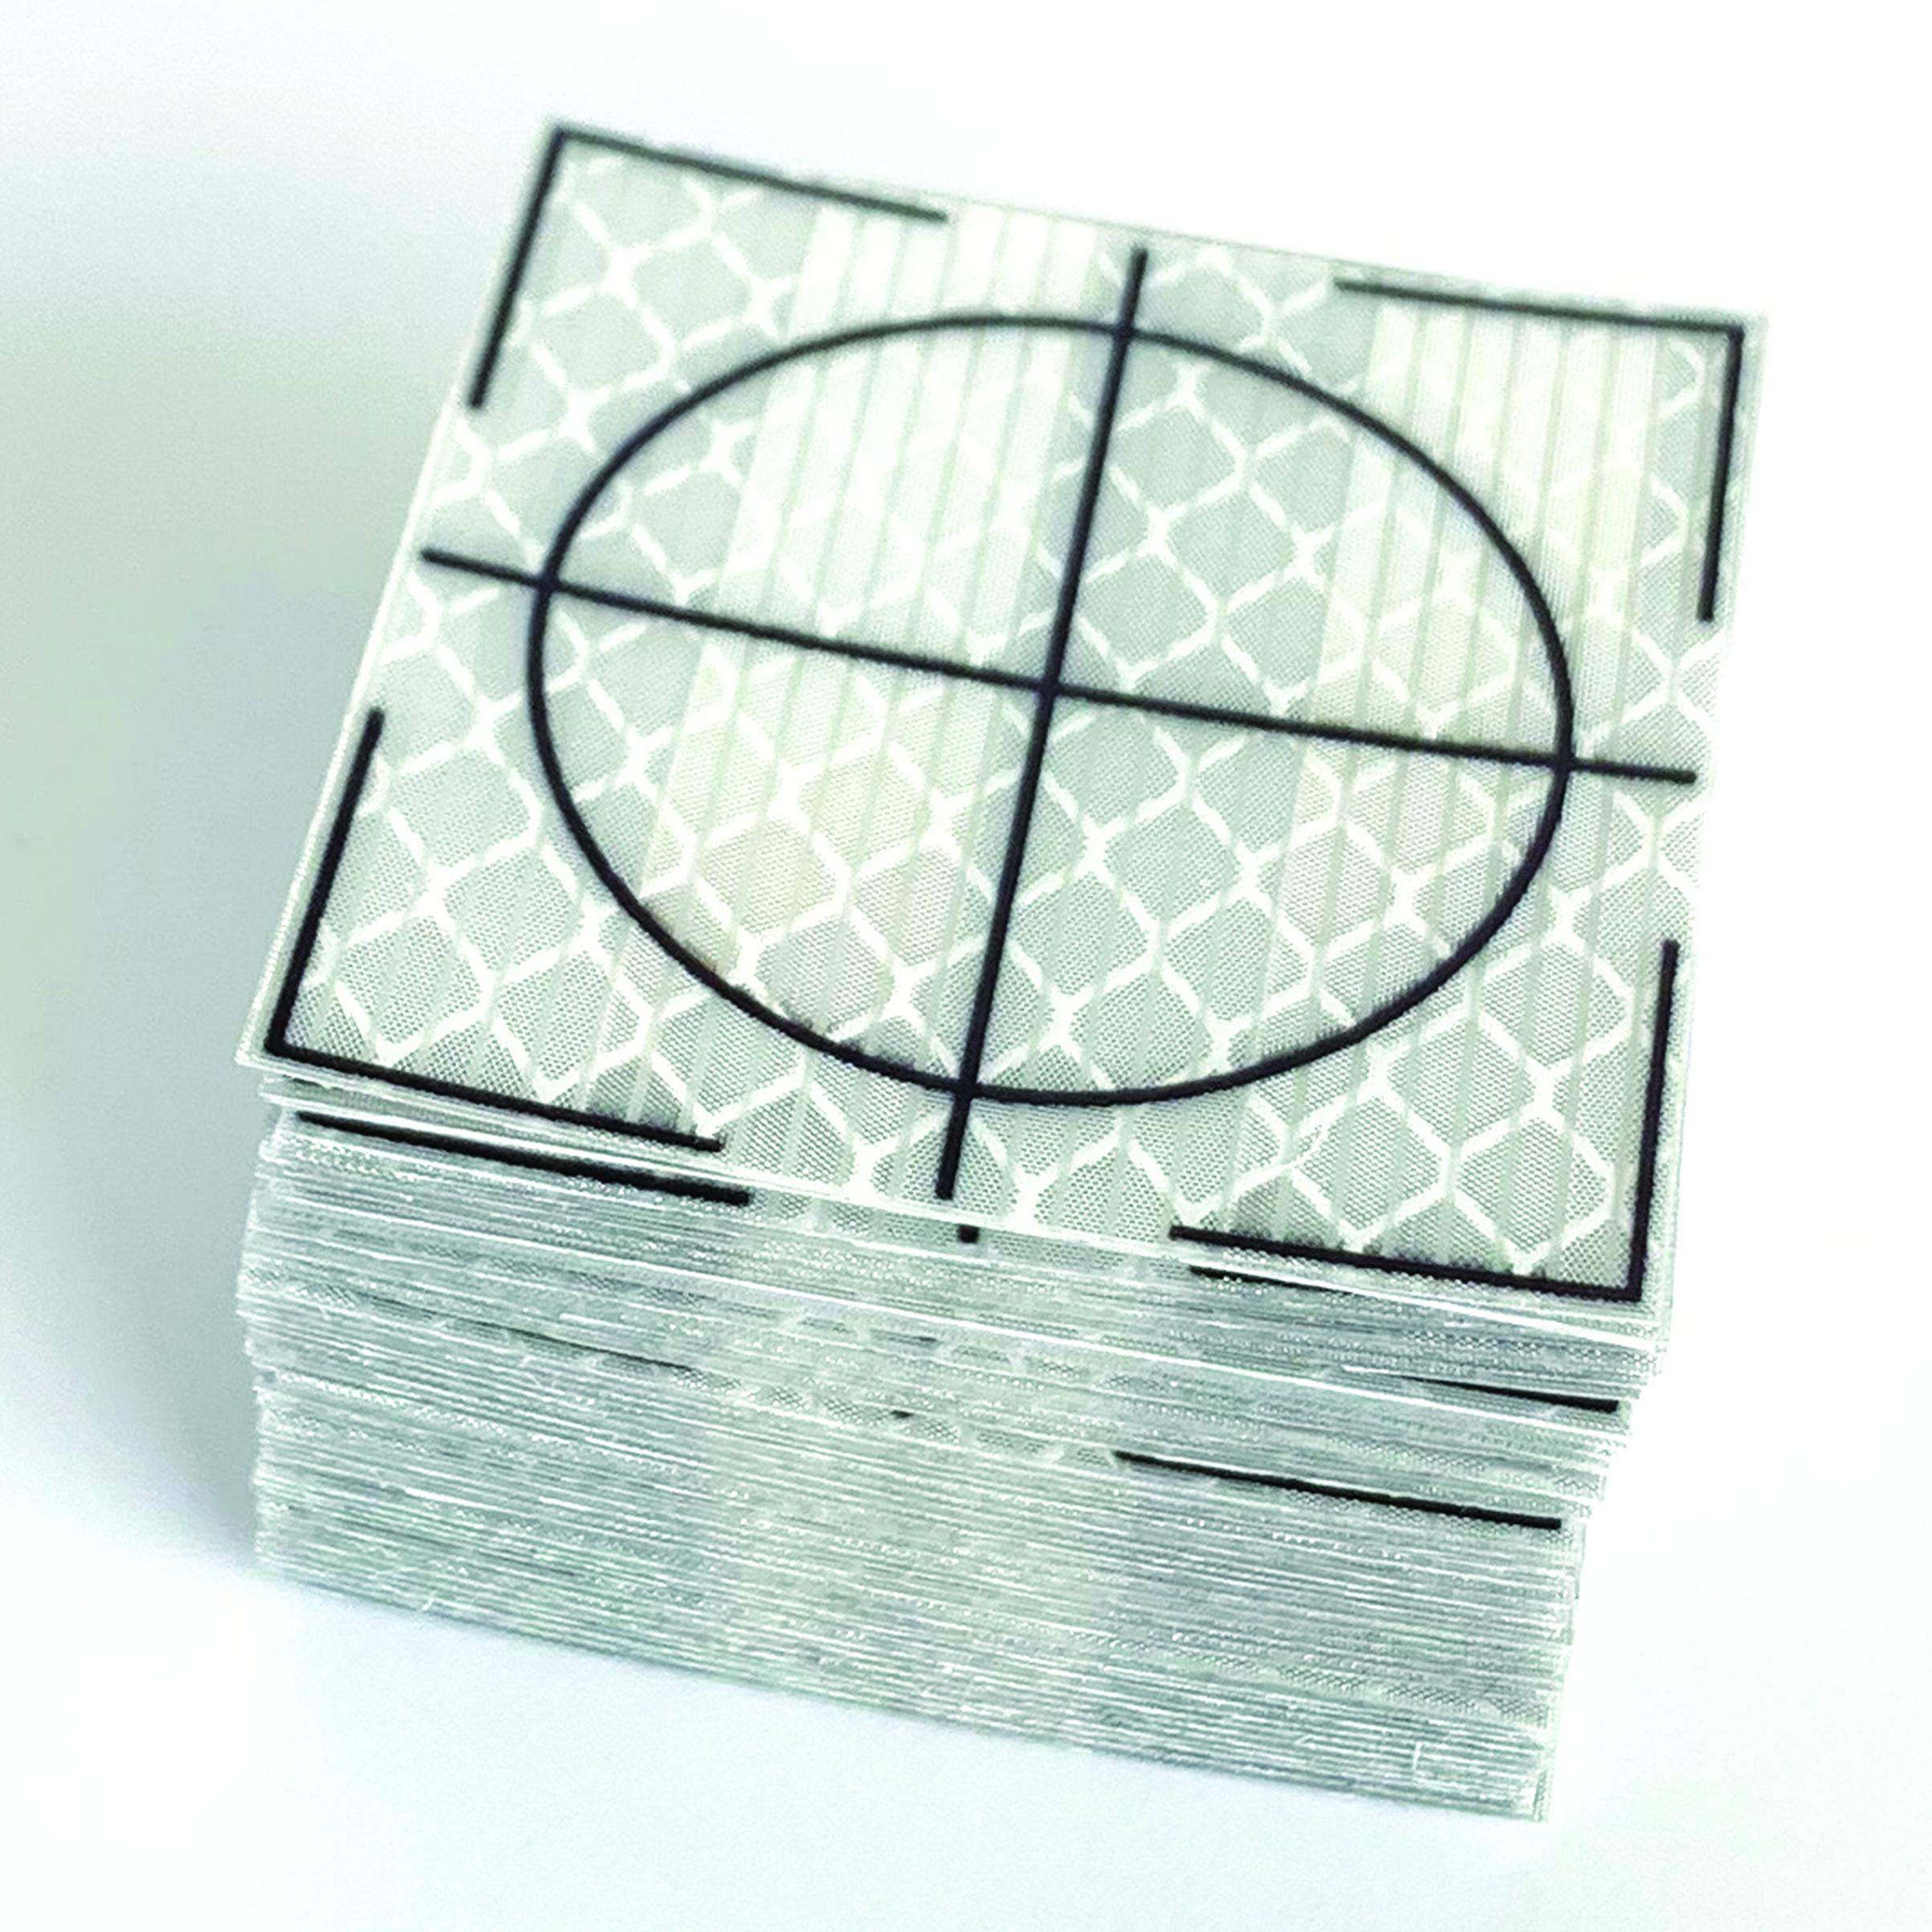 3M Reflective Vinyl